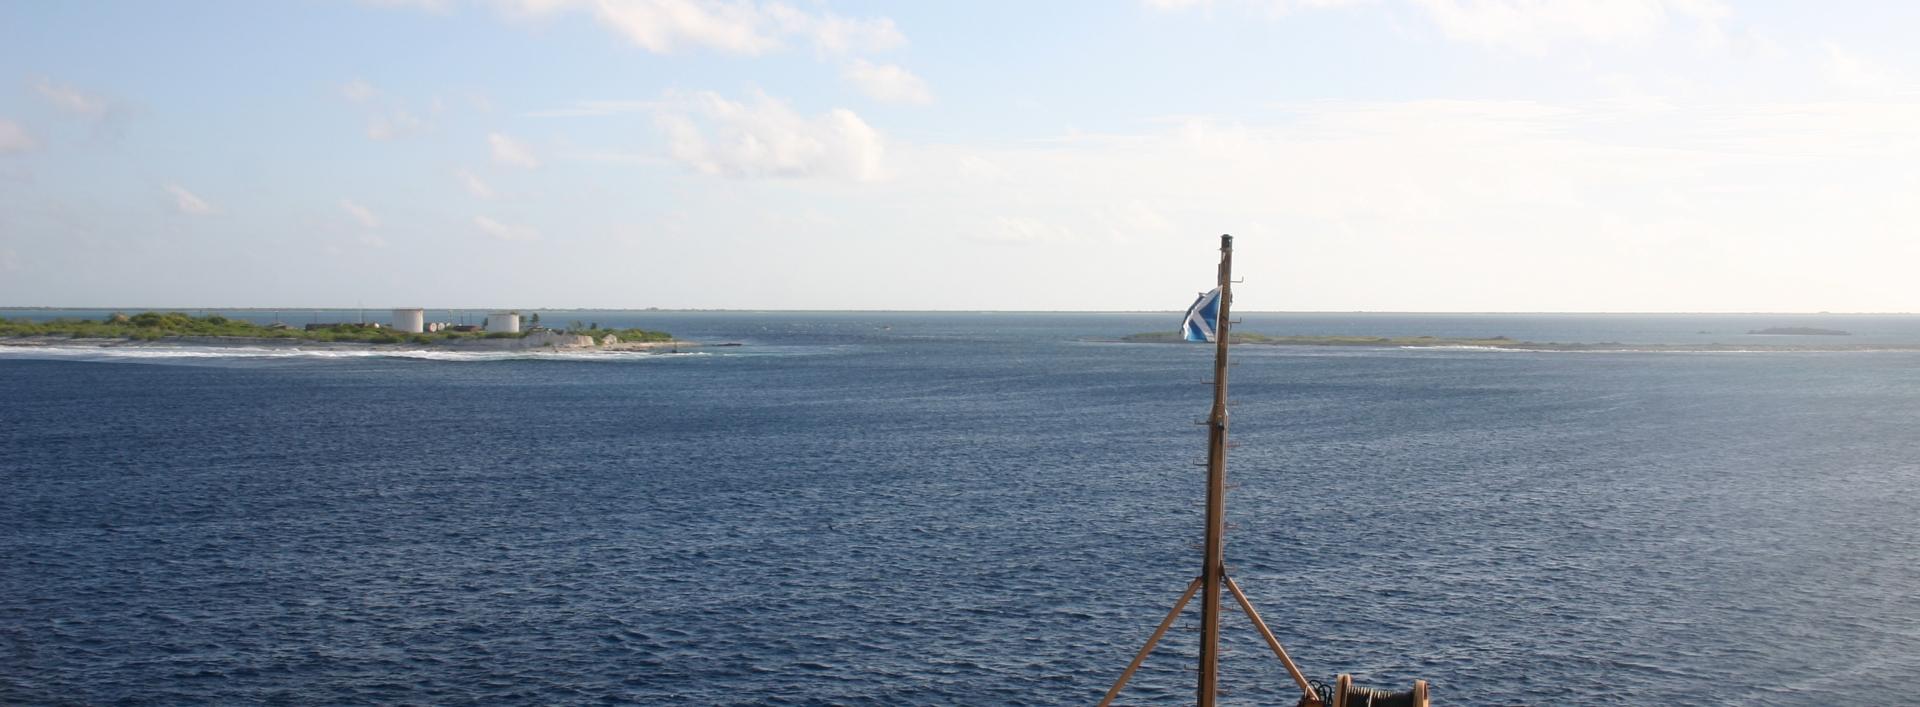 Calm ocean and small island shore